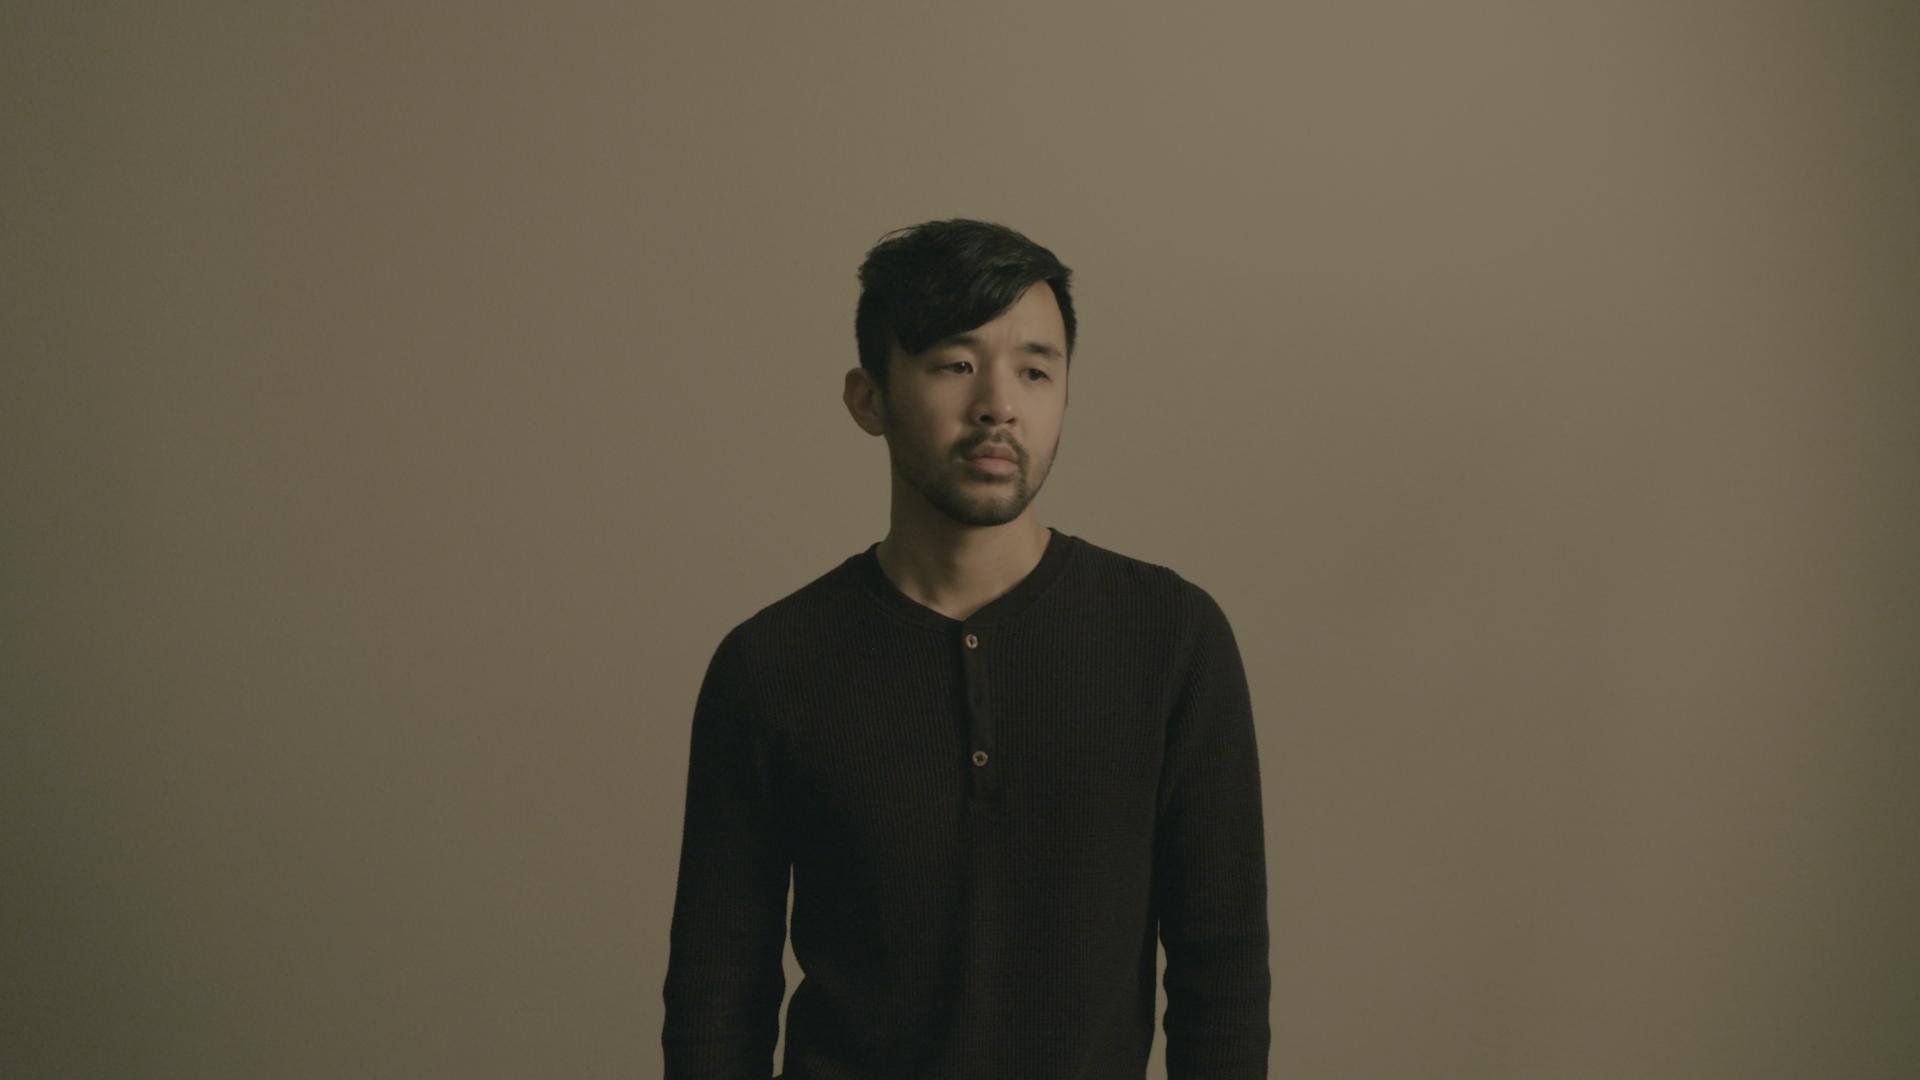 Nate Tao: Never Be Like You (2016) Music Video Gaffer, Editor Tao Dynasty  https://www.youtube.com/watch?v=6aZdW6SWVgQ